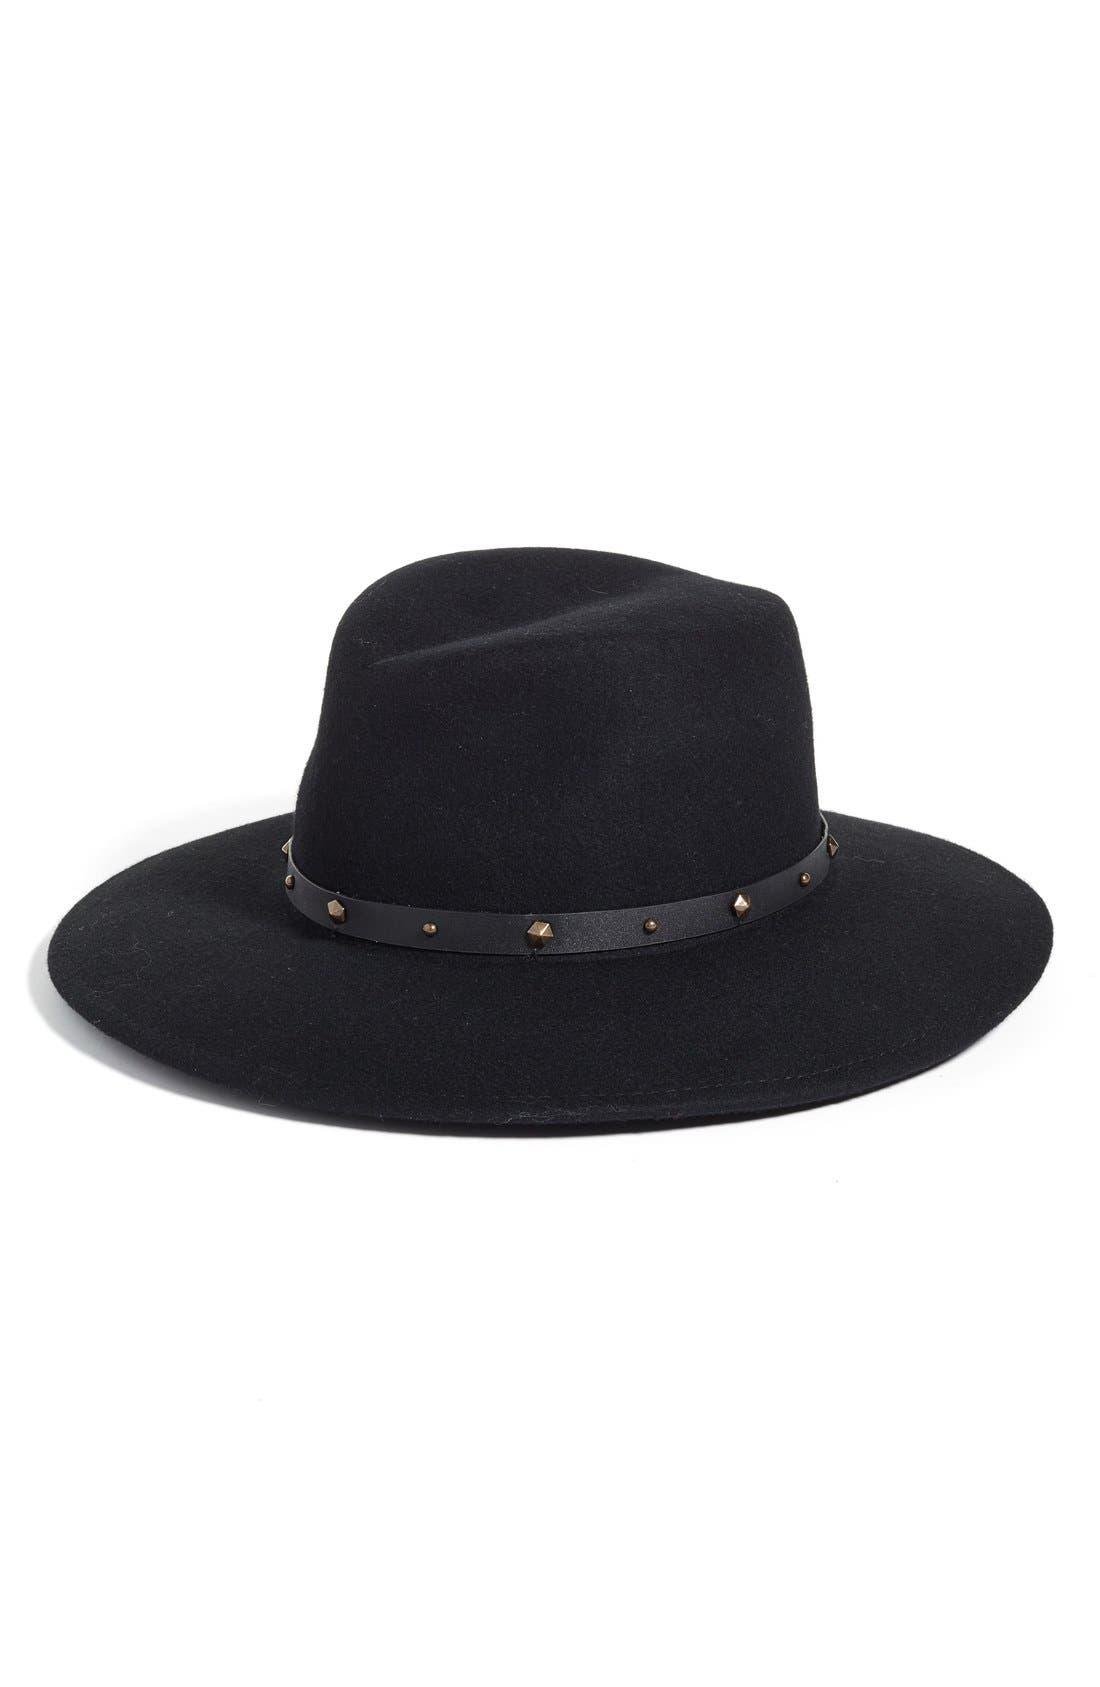 Karli Wool Felt Wide Brim Hat,                         Main,                         color, 001